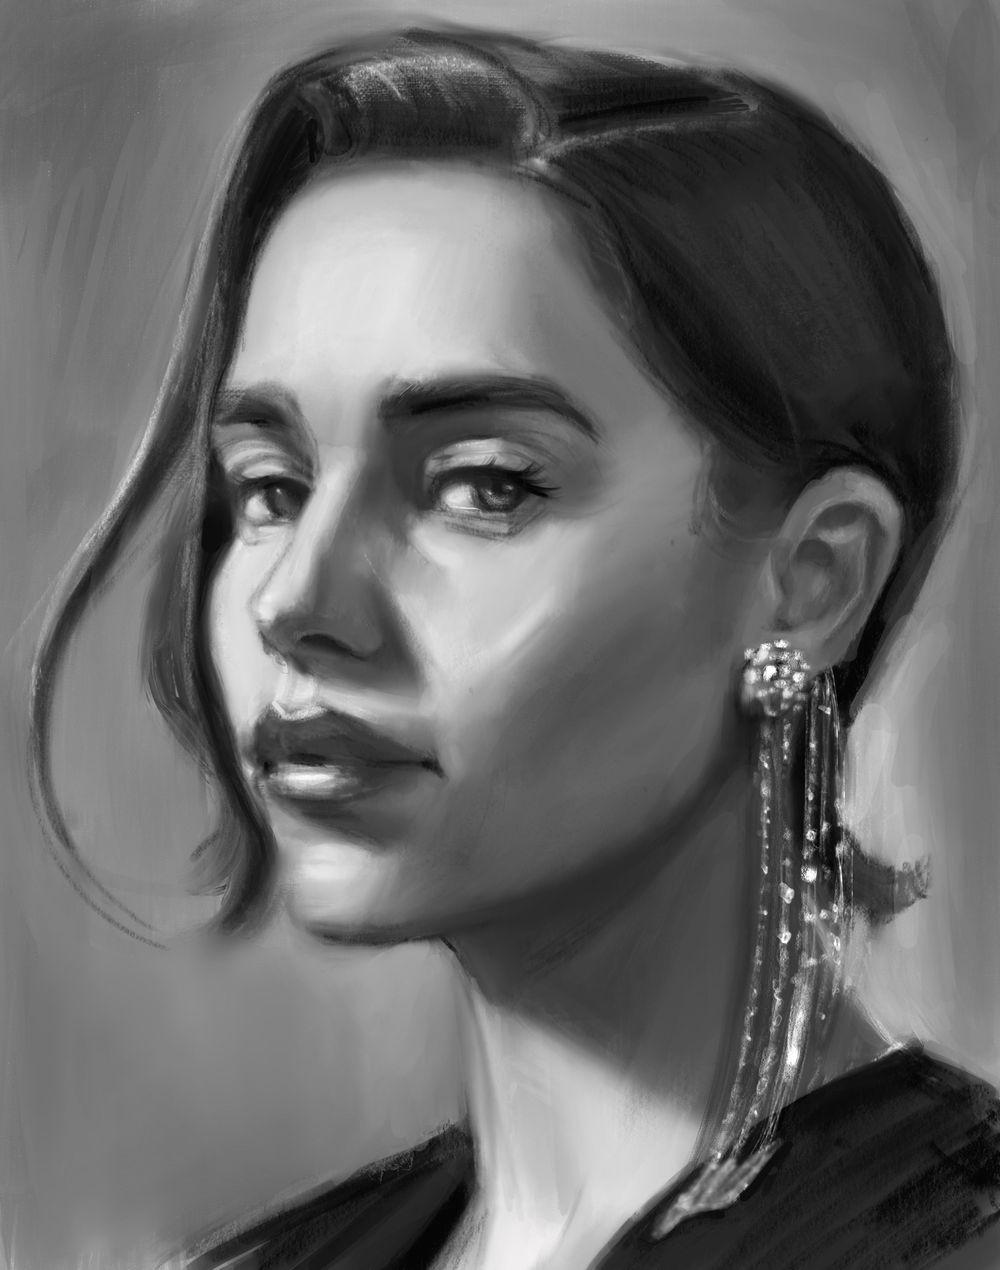 Portraits - image 18 - student project